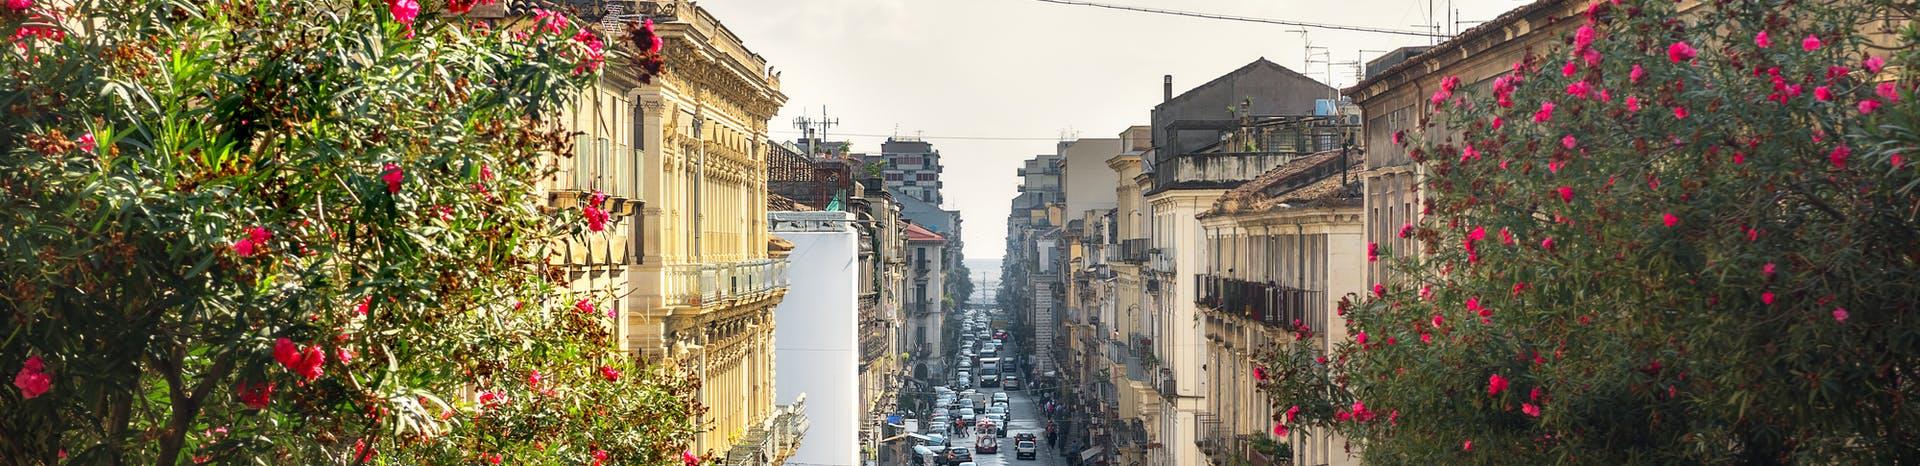 Picture of Catania